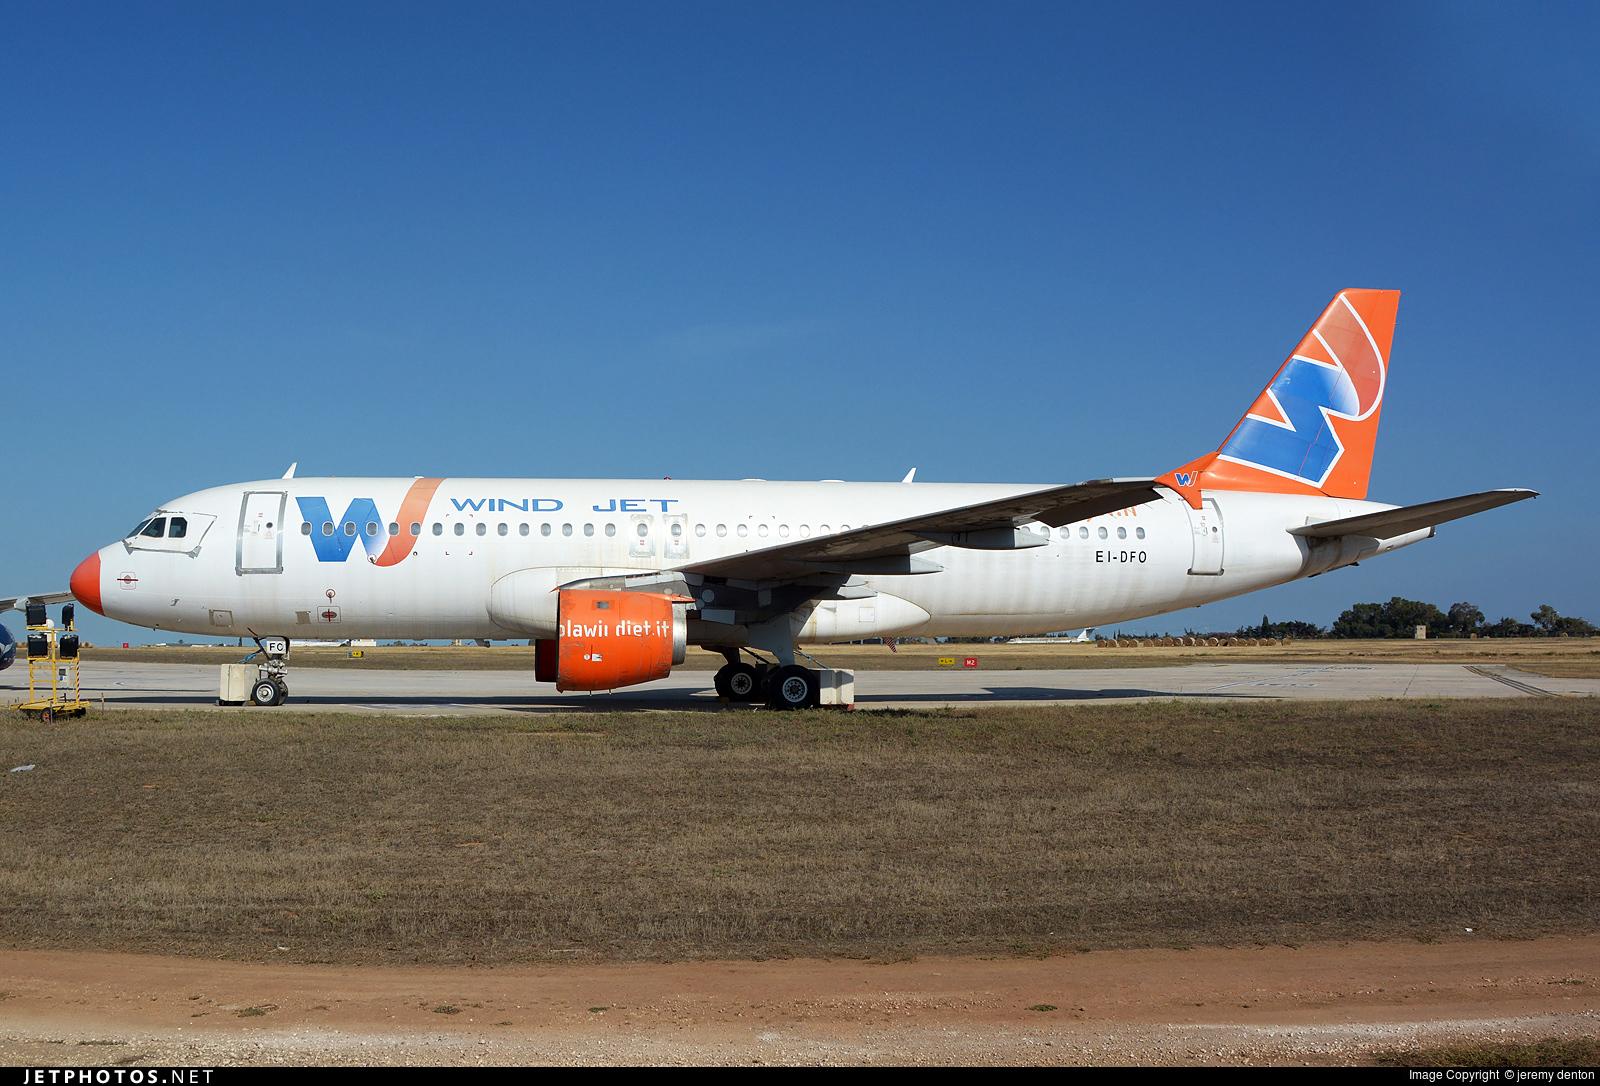 EI-DFO | Airbus A320-211 | Wind Jet | jeremy denton | JetPhotos